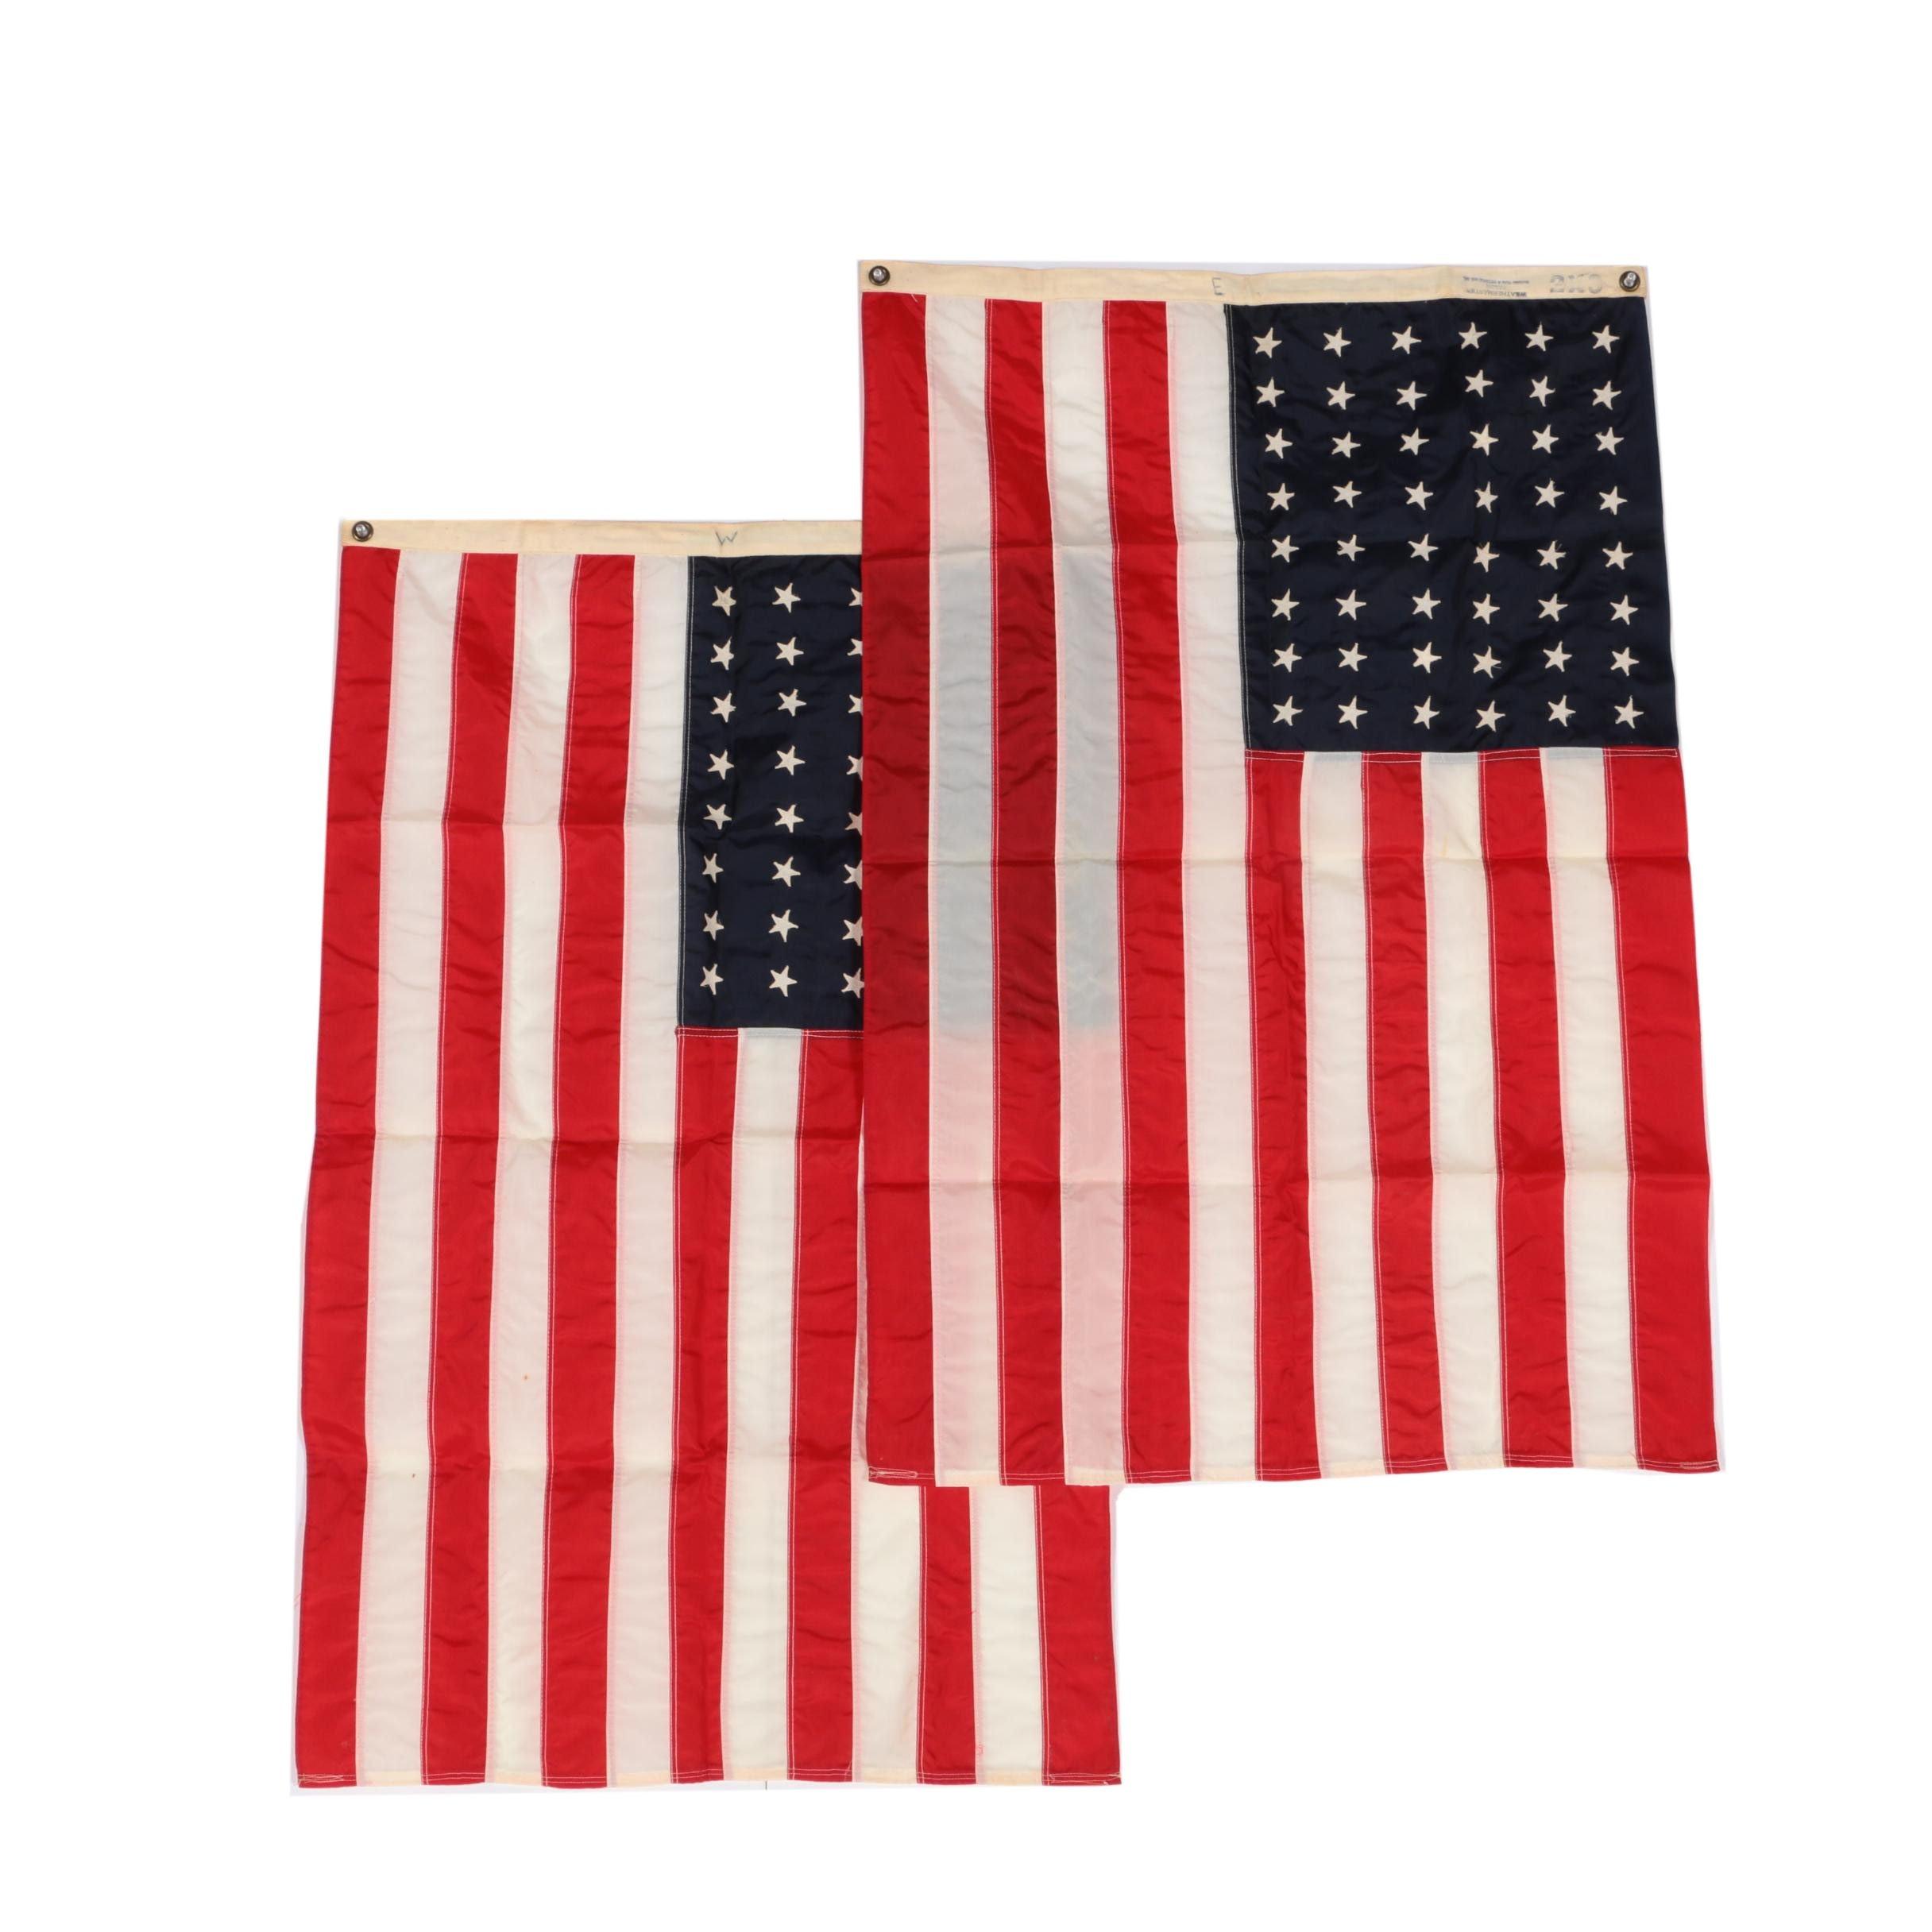 Vintage Nylon 48 Star American Flags